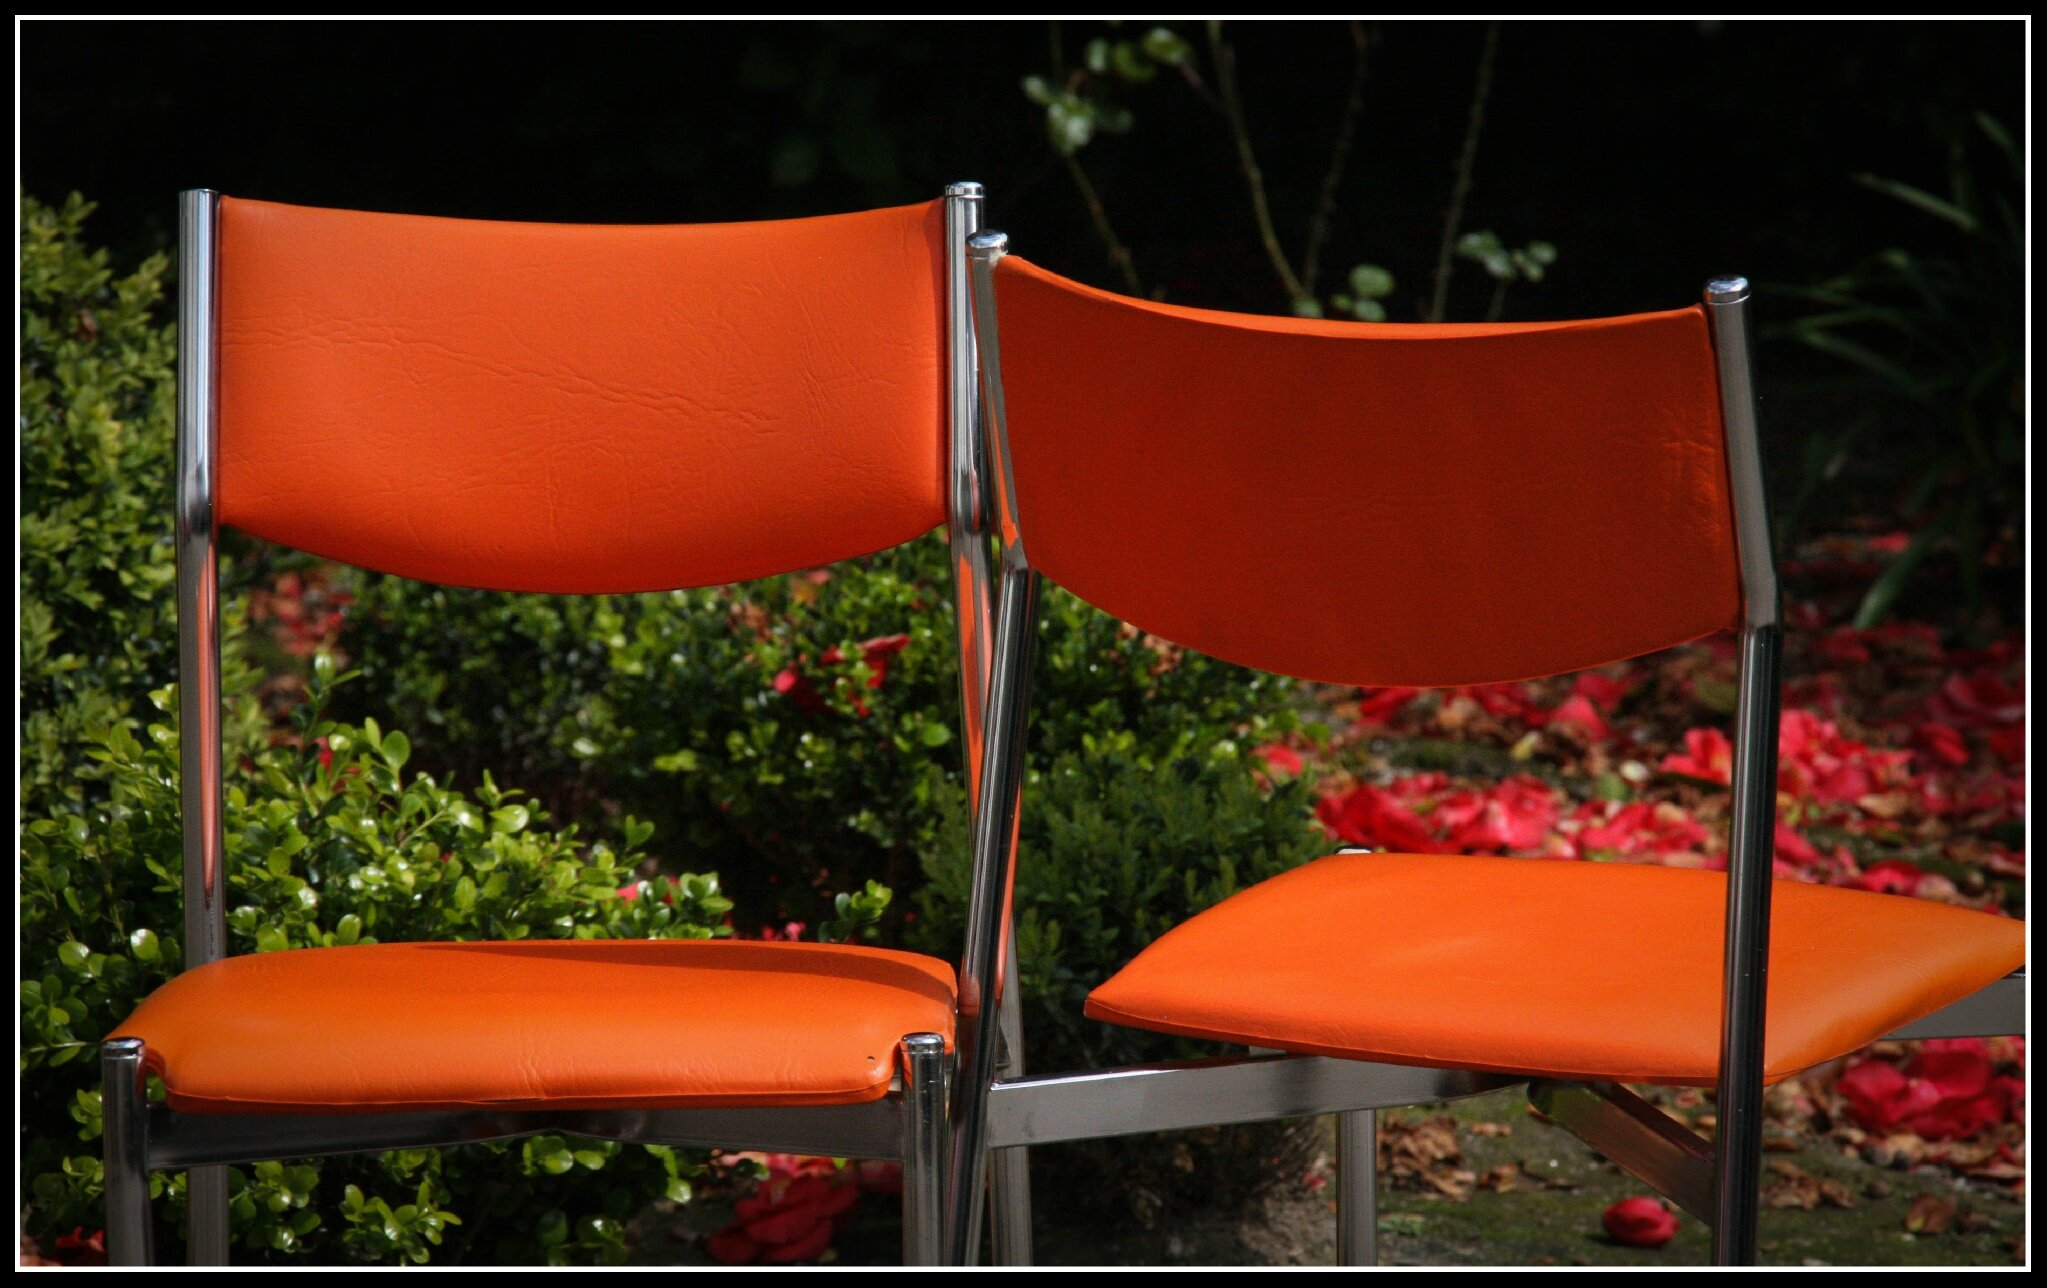 701 chaises vintage 70s skai orange